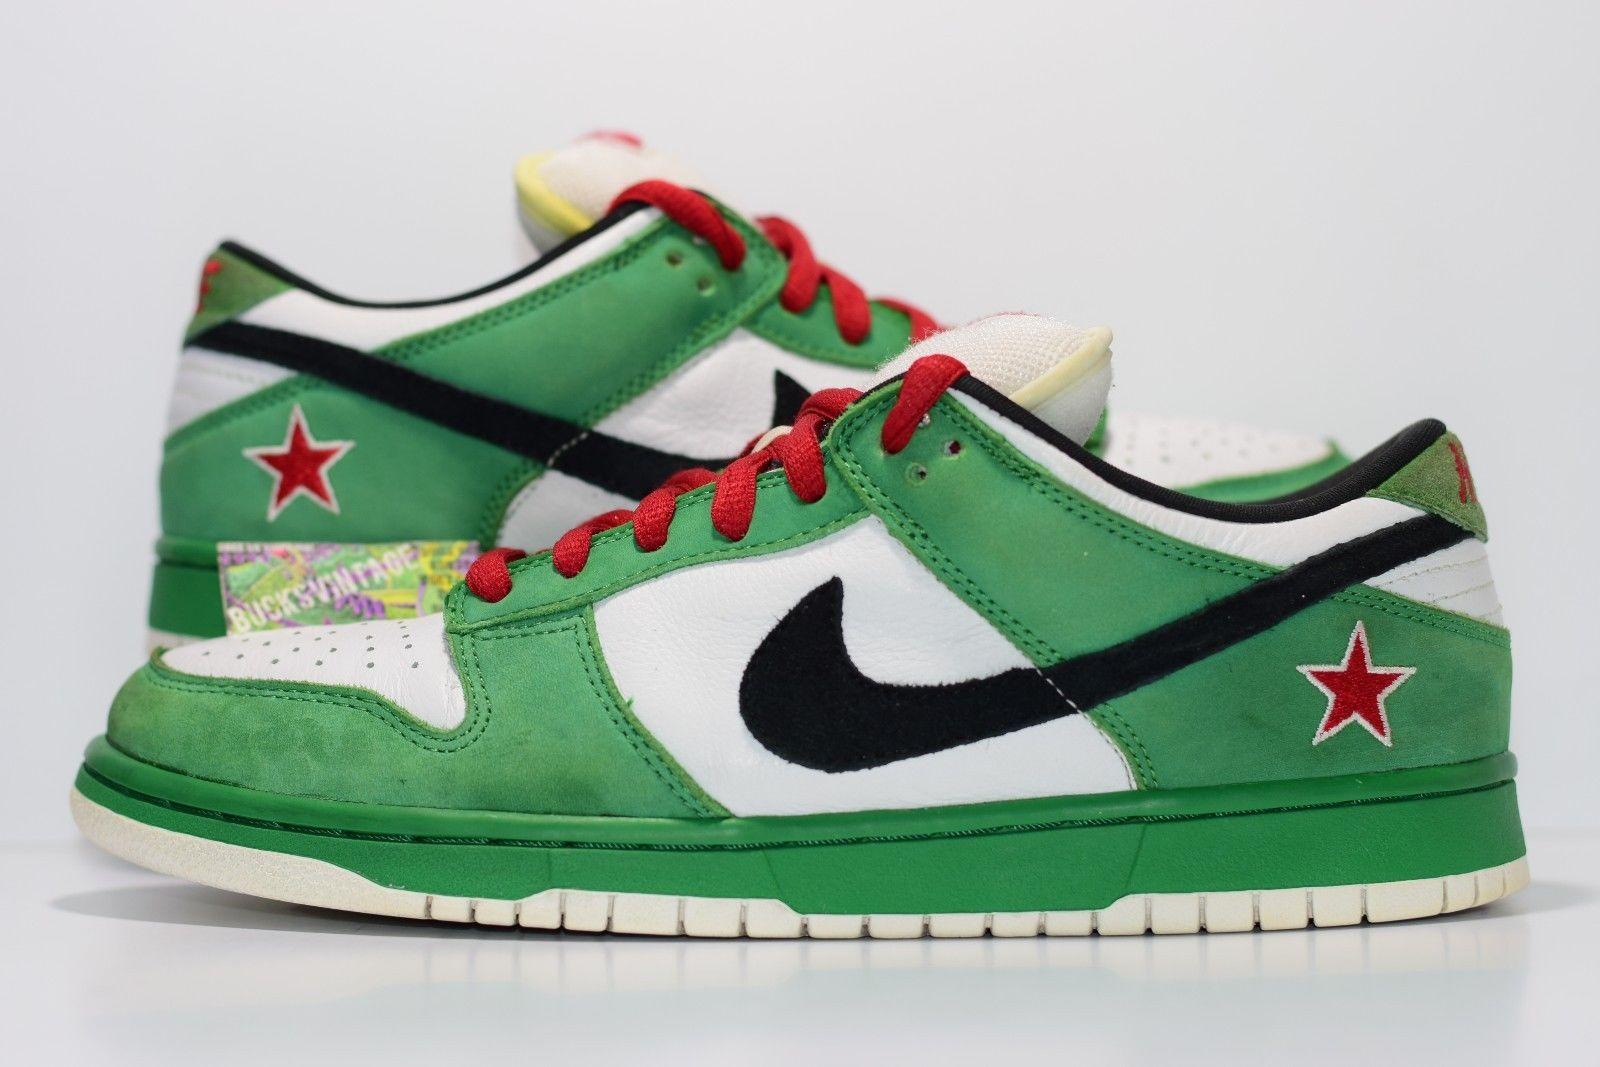 watch b9196 0cd63 Size 10.5   2003 Nike Dunk SB Low Heineken Premium Authentic Rare  304292-302 from BucksVintage